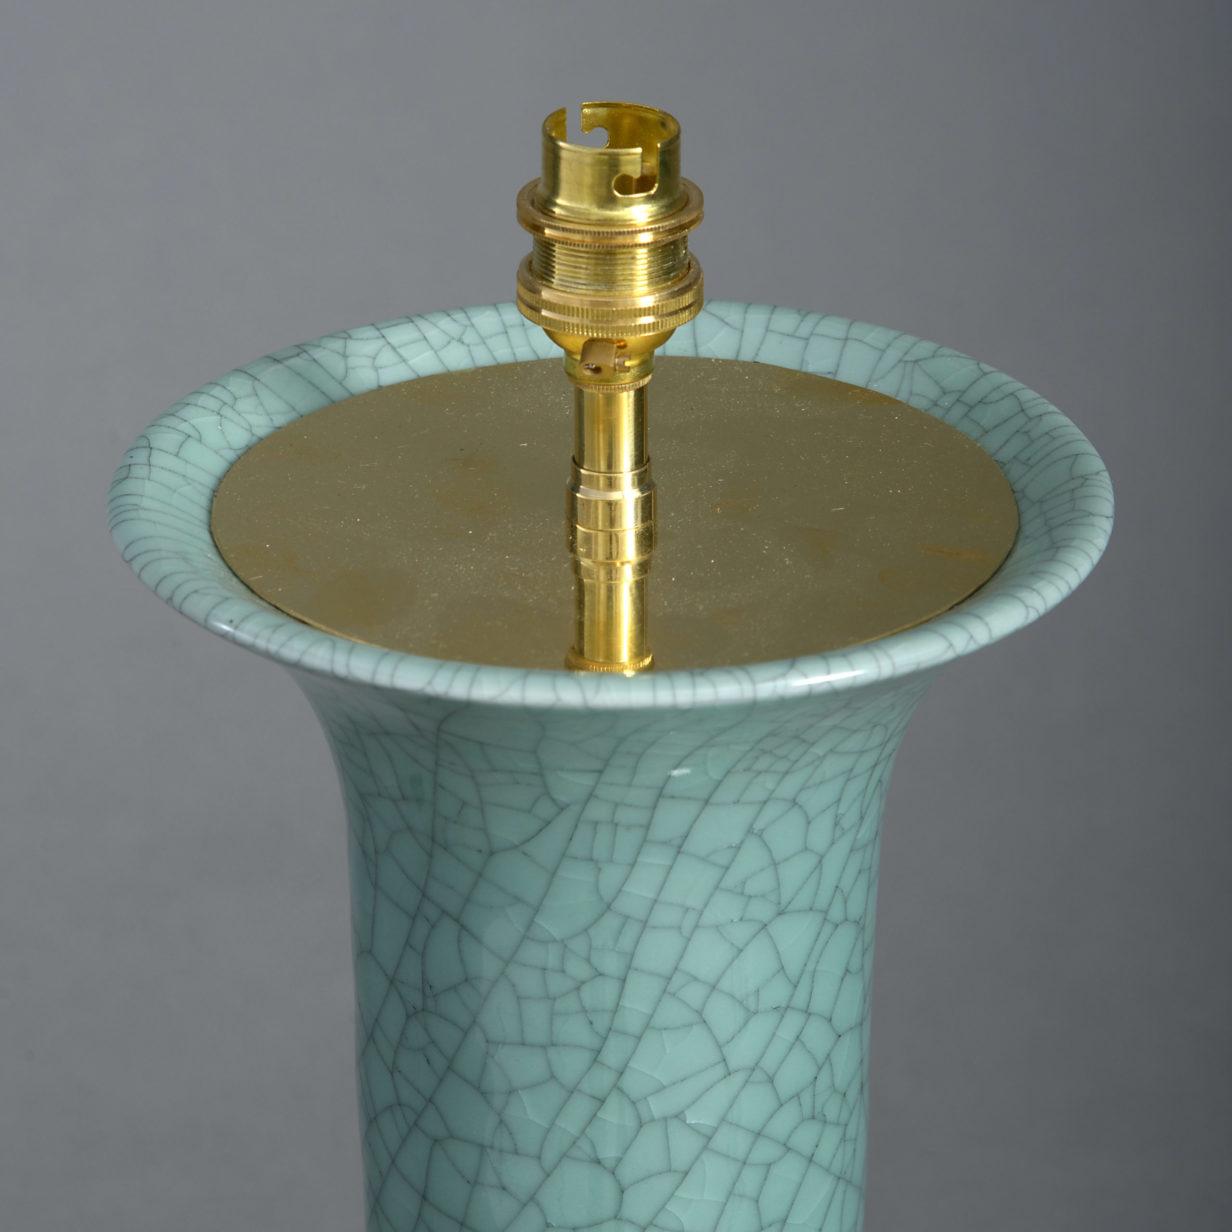 Smaller Celadon Vase Lamp